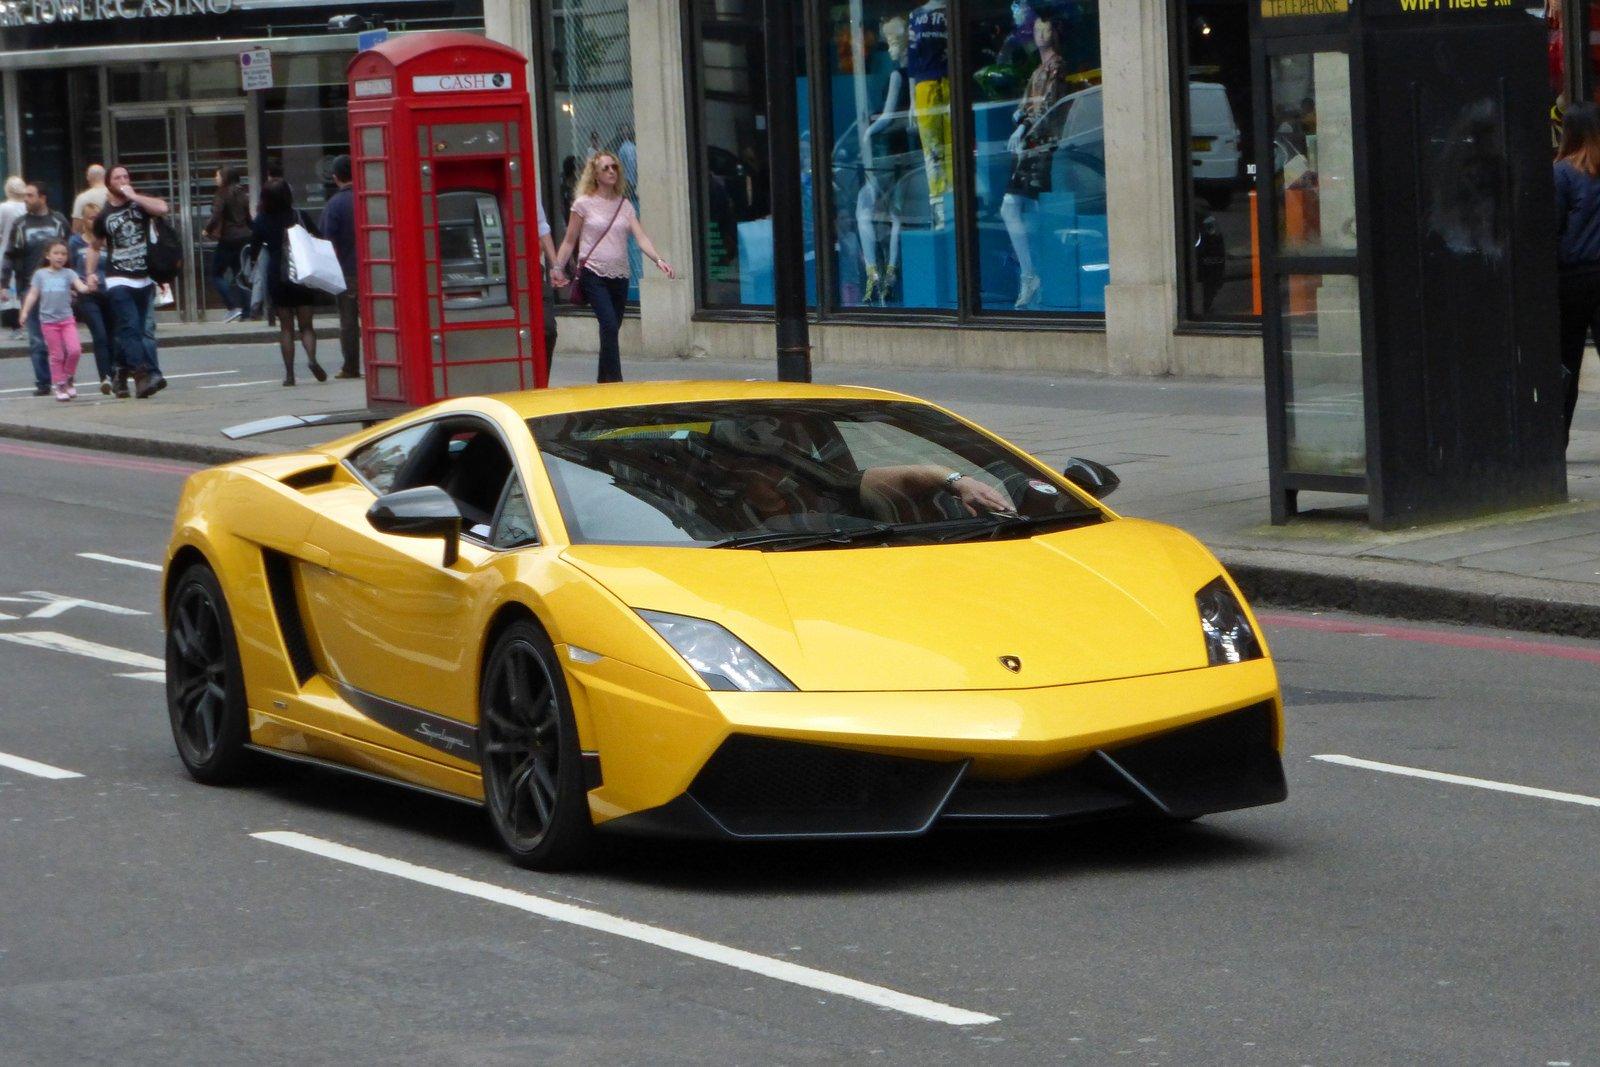 lamborghini gallardo lp570 4 superleggera italian dreamcar supercar exotic sportscar giallo jaune yellow wallpaper 1600x1067 404632 wallpaperup